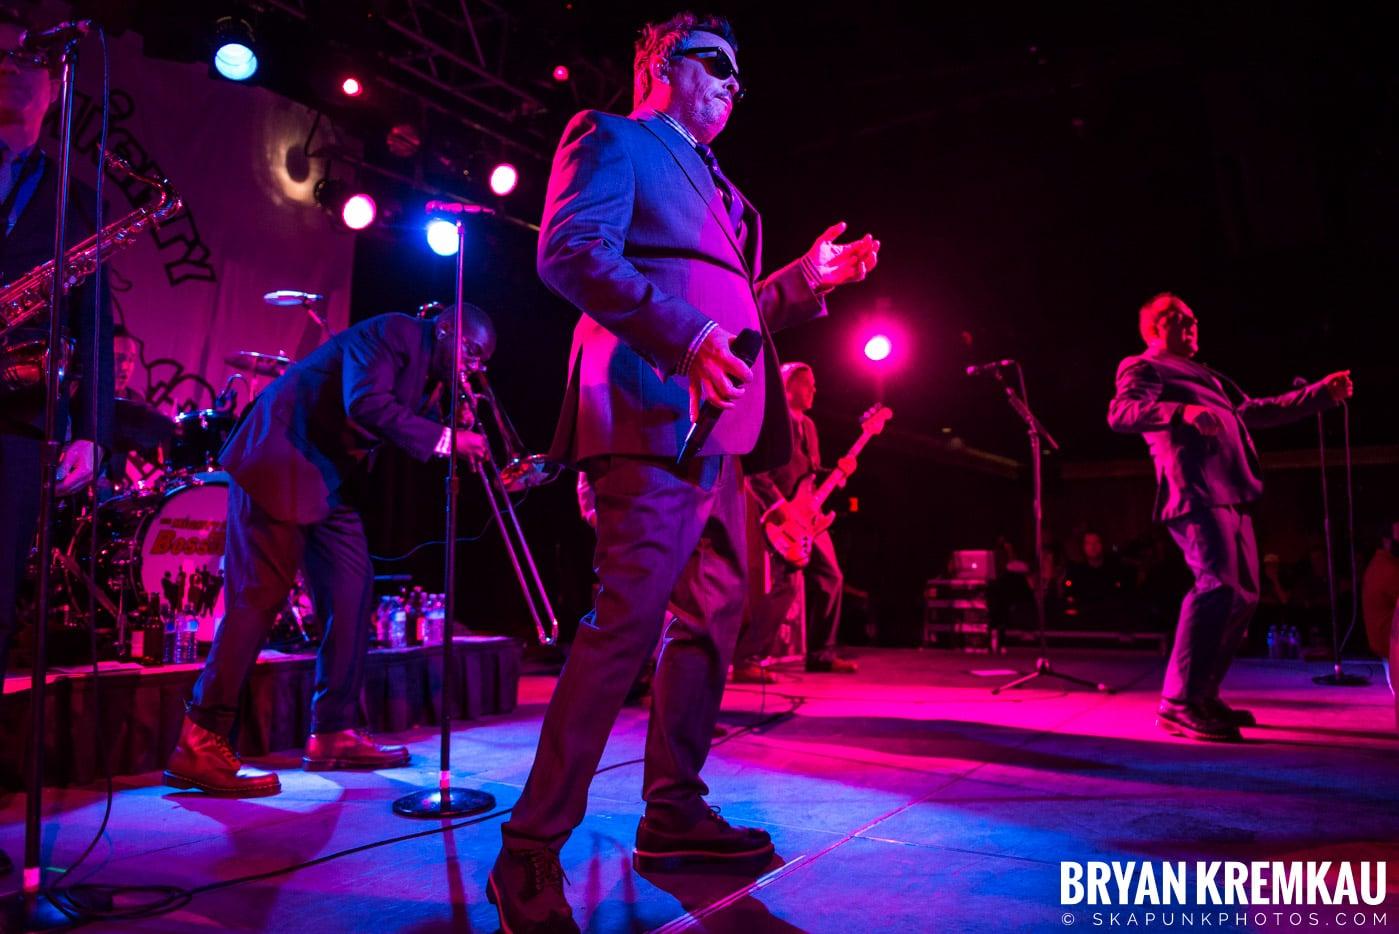 Mighty Mighty Bosstones @ Starland Ballroom, Sayreville, NJ - 7.29.17 (4)